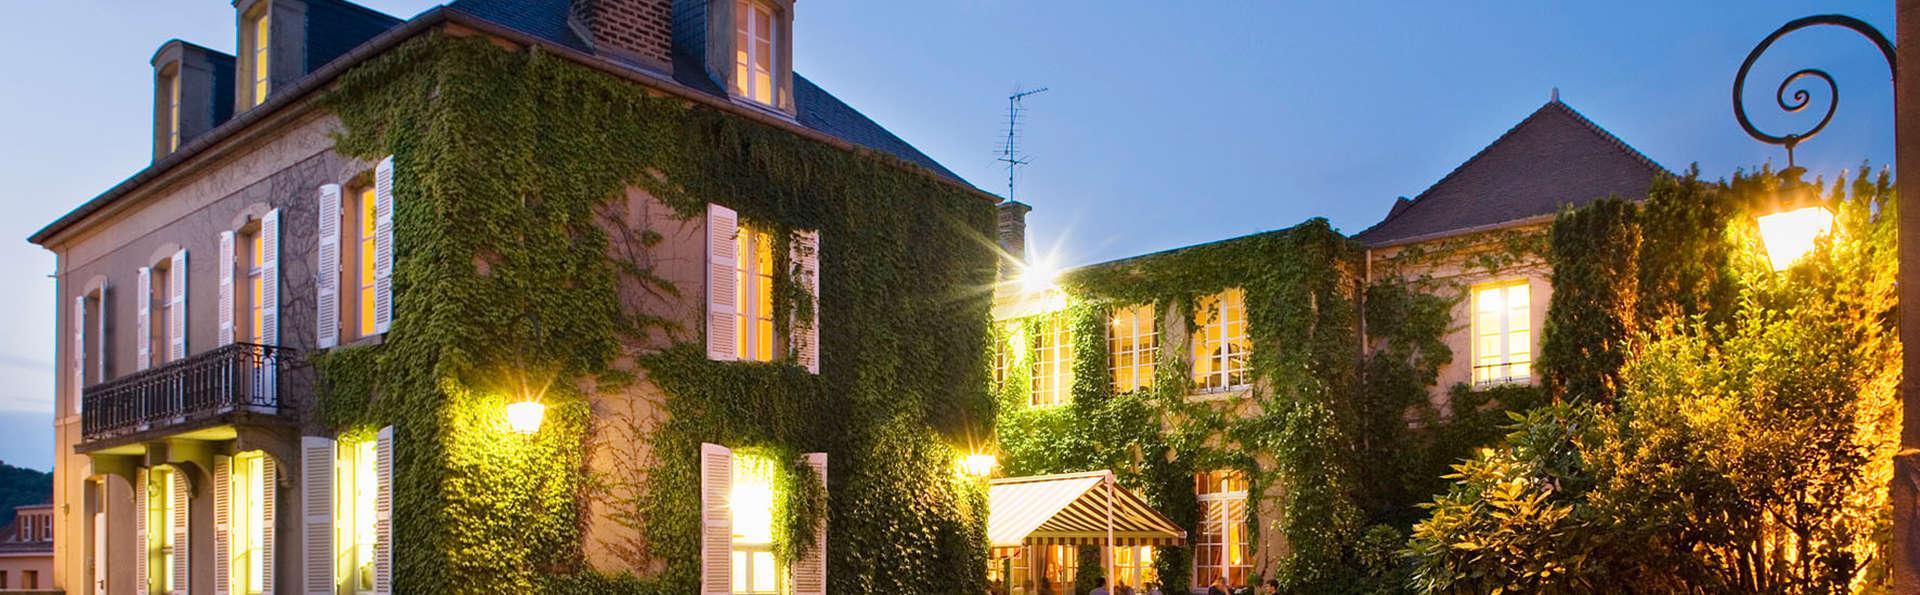 Hôtel La Petite Verrerie - EDIT_front1.jpg